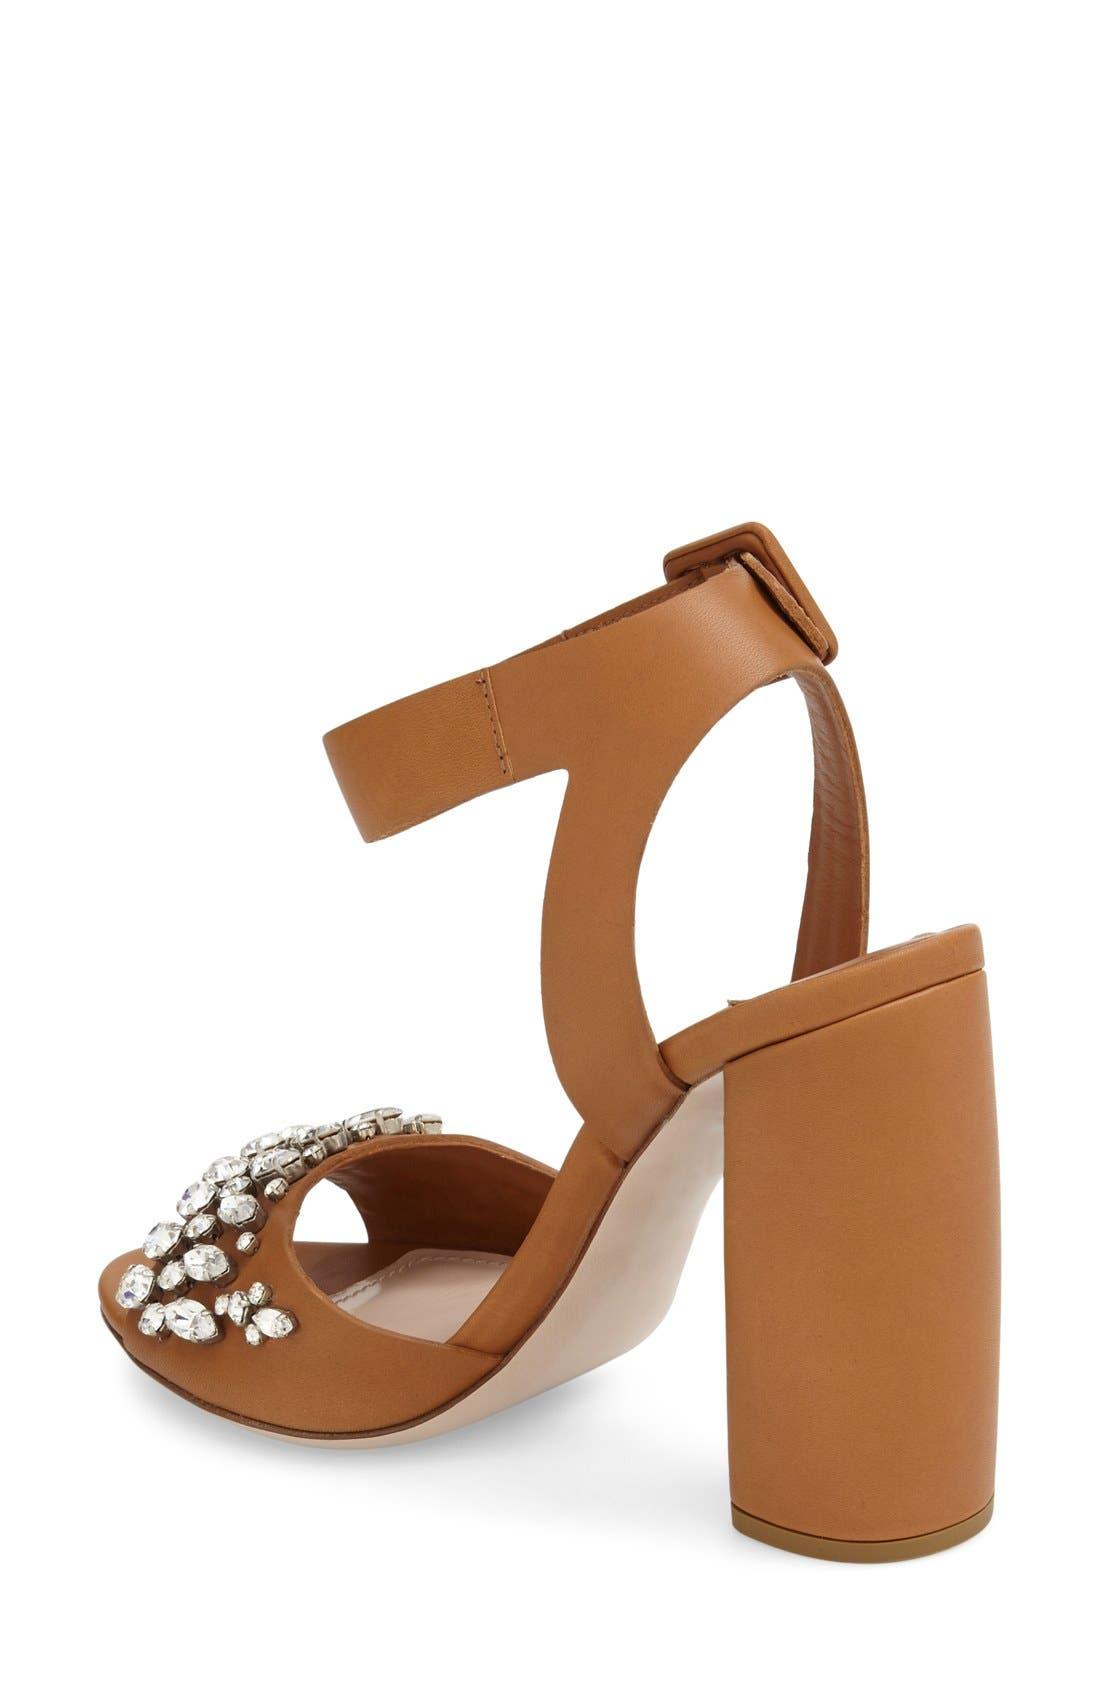 Alternate Image 2  - Miu Miu 'Jewel' Sandal (Women)